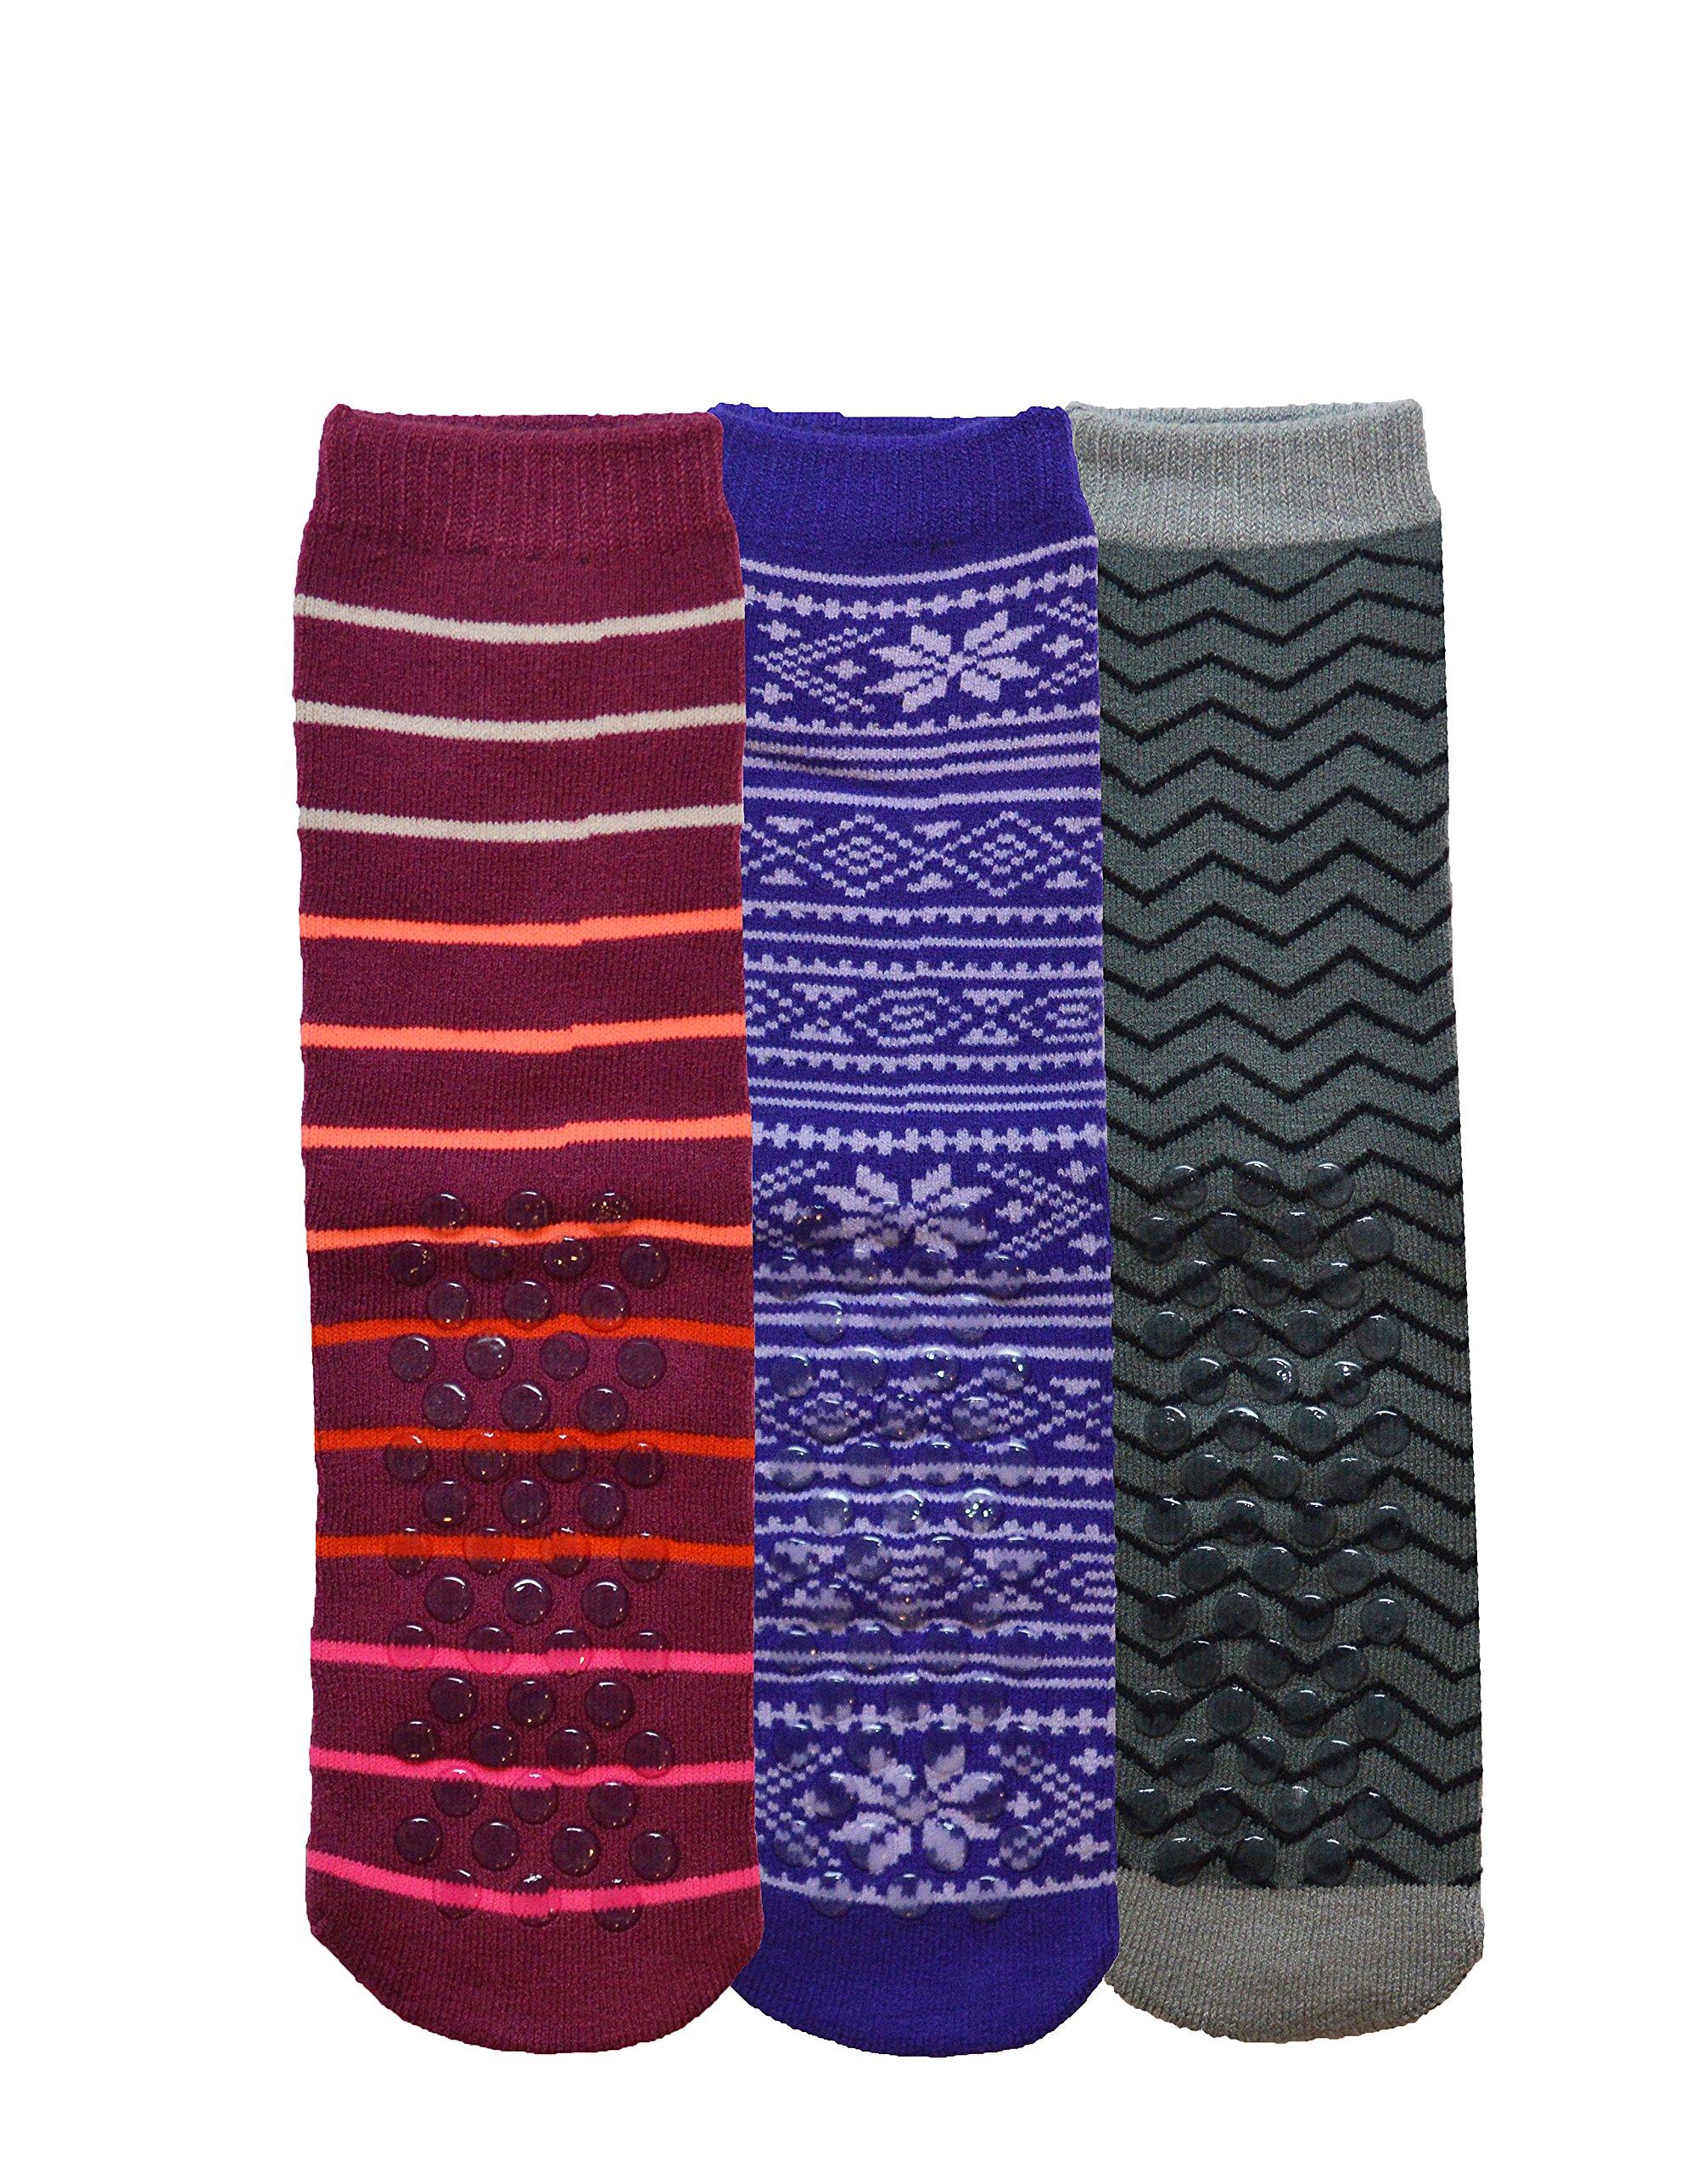 Womens Gripper Socks, Adult Non Skid Sock, Soft Cotton Slipper Socks (Womens One Size, 3 Pack Patterned)